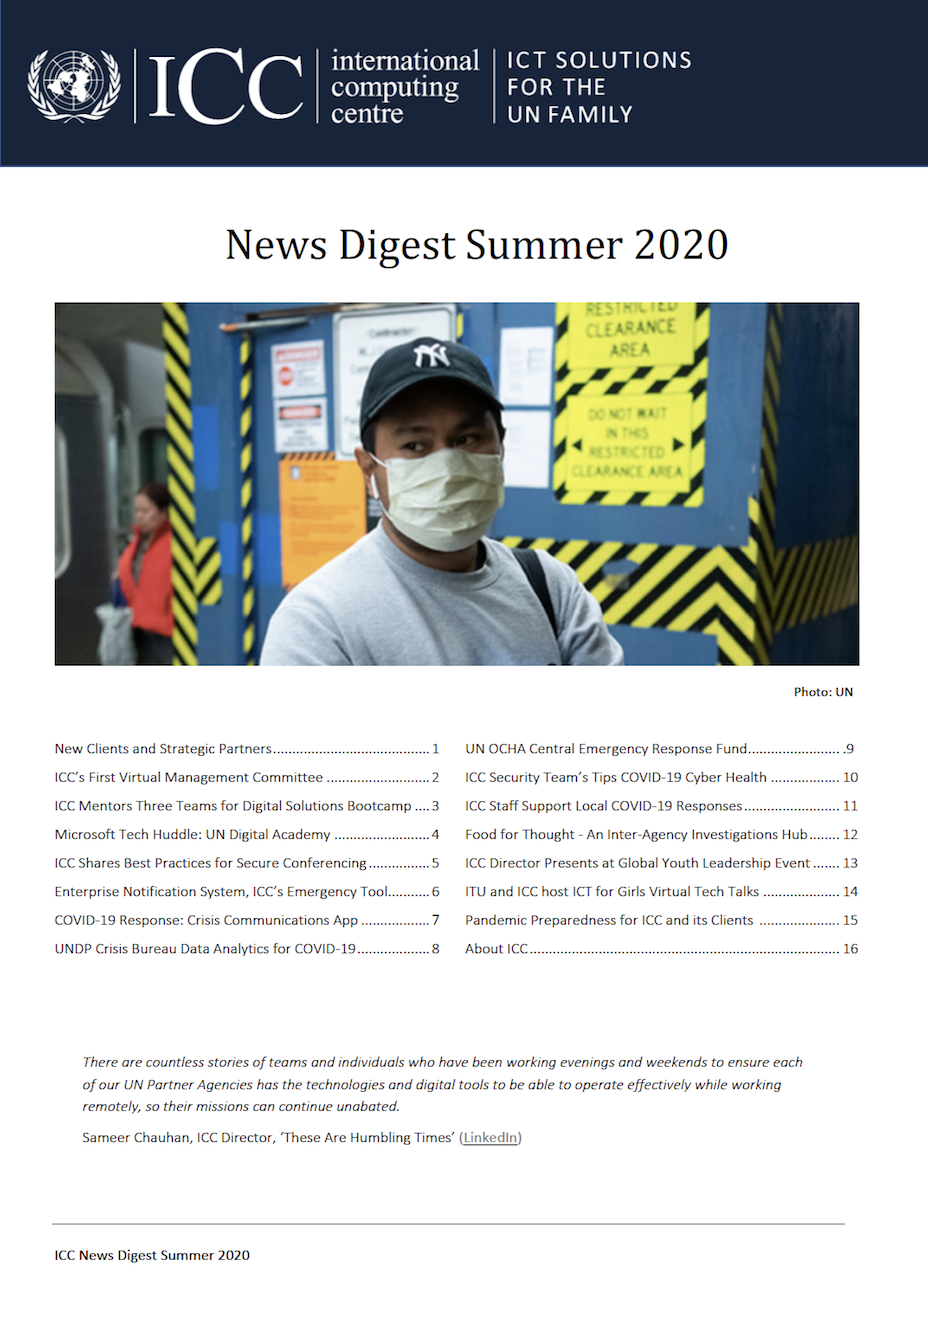 UNICC News Digest Summer 2020